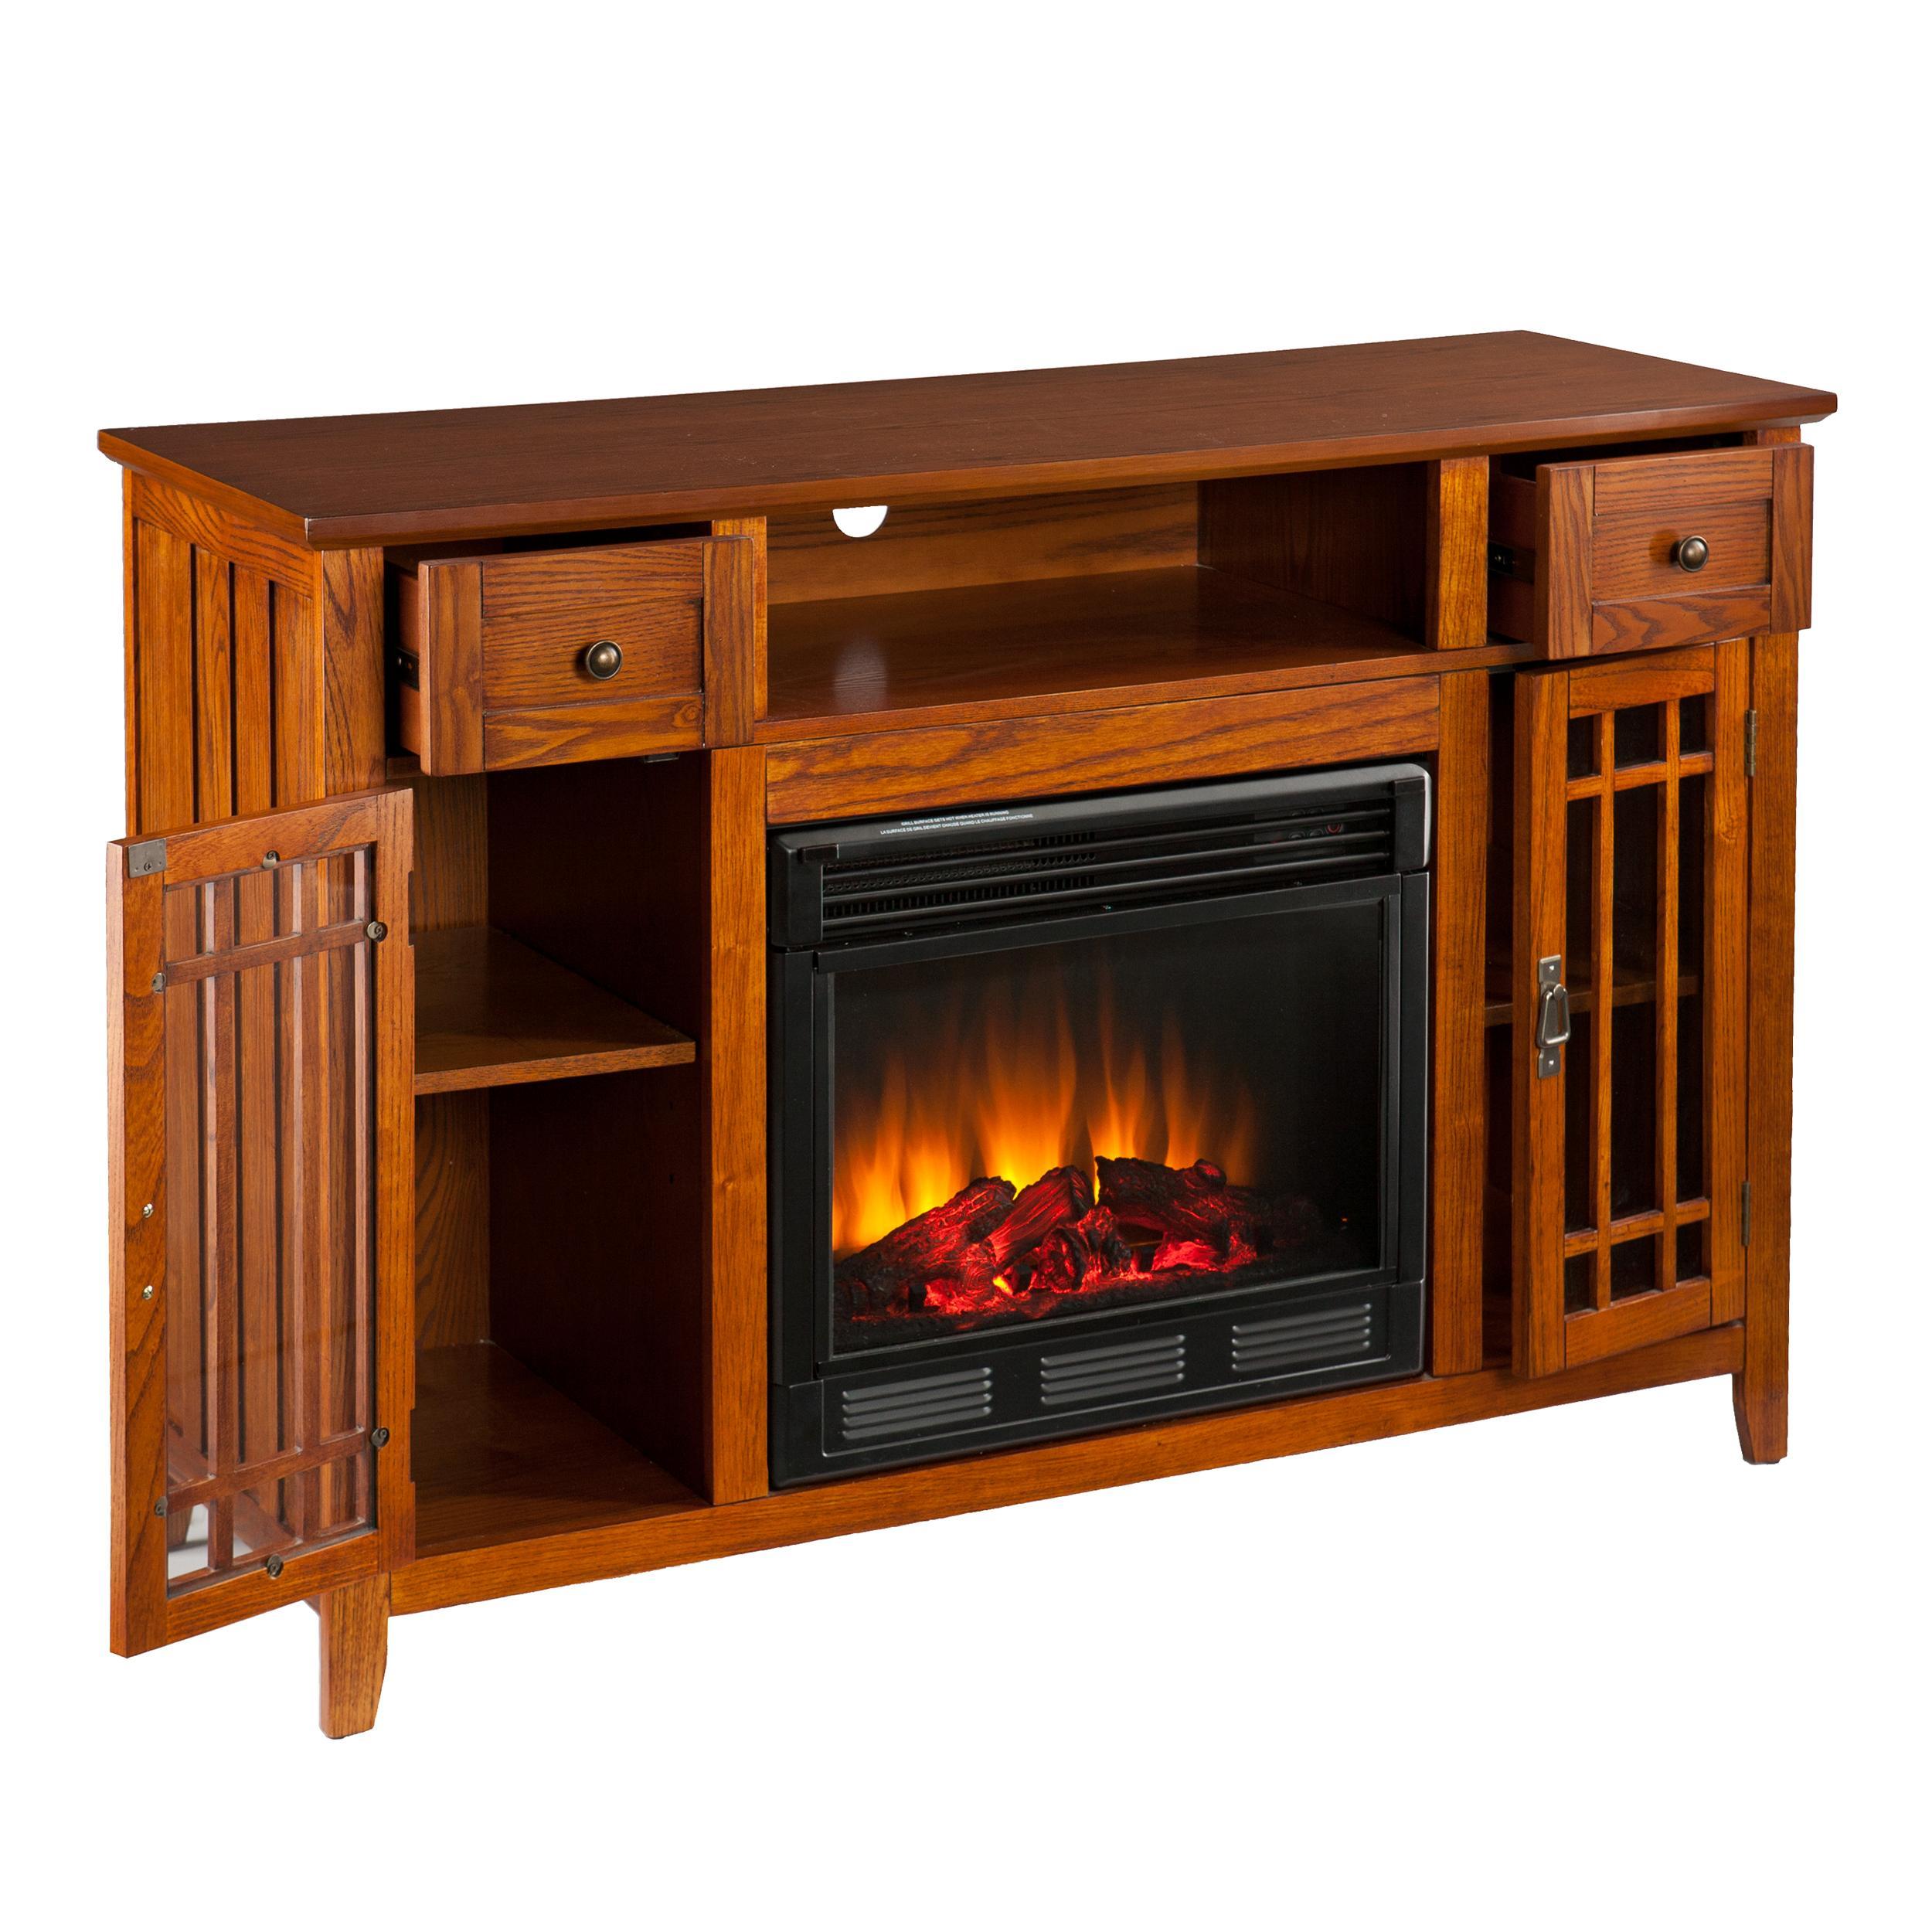 Amazon.com: SEI AMZ3839E Salinas Electric Media Fireplace, Mission Oak: Home & Kitchen